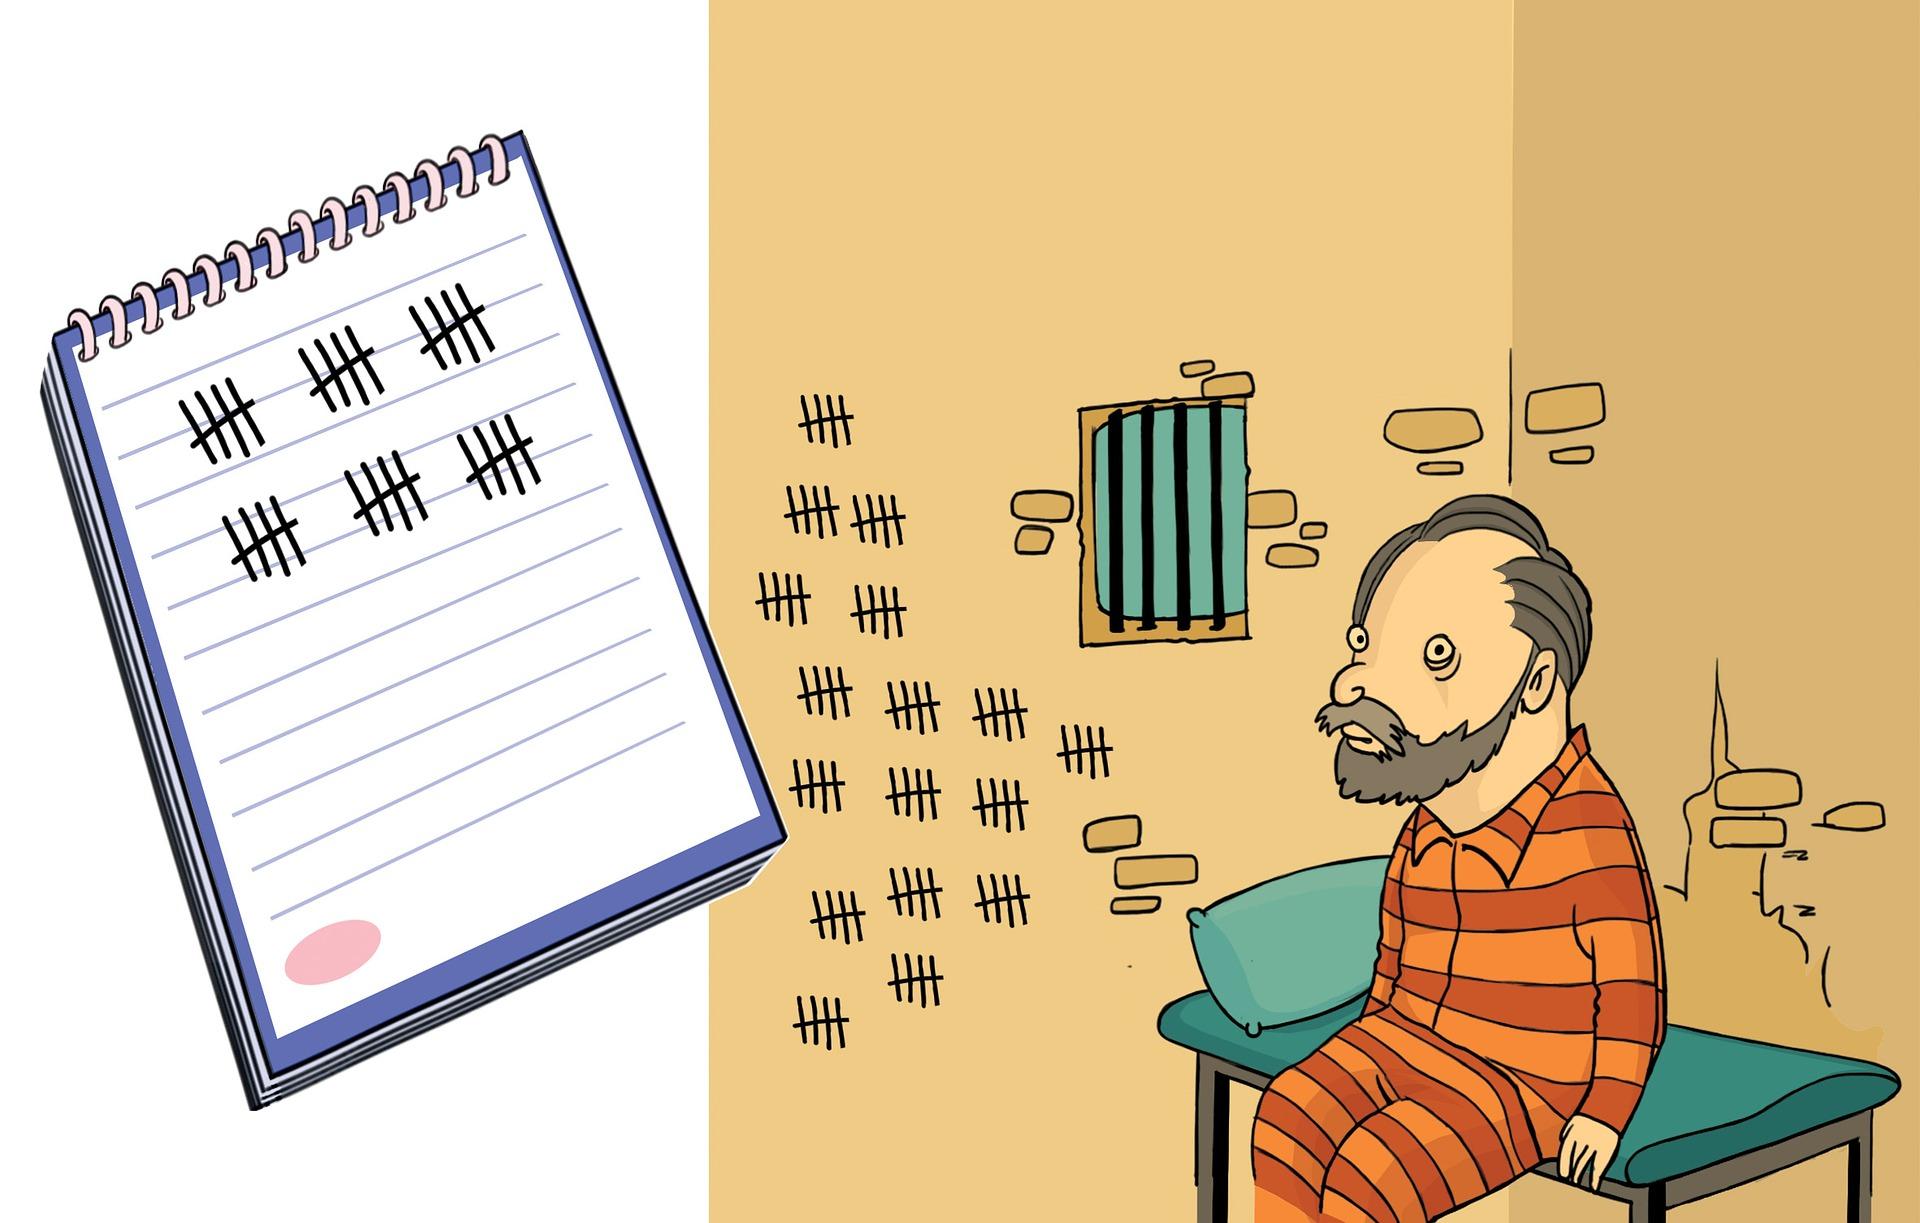 A man in prison.